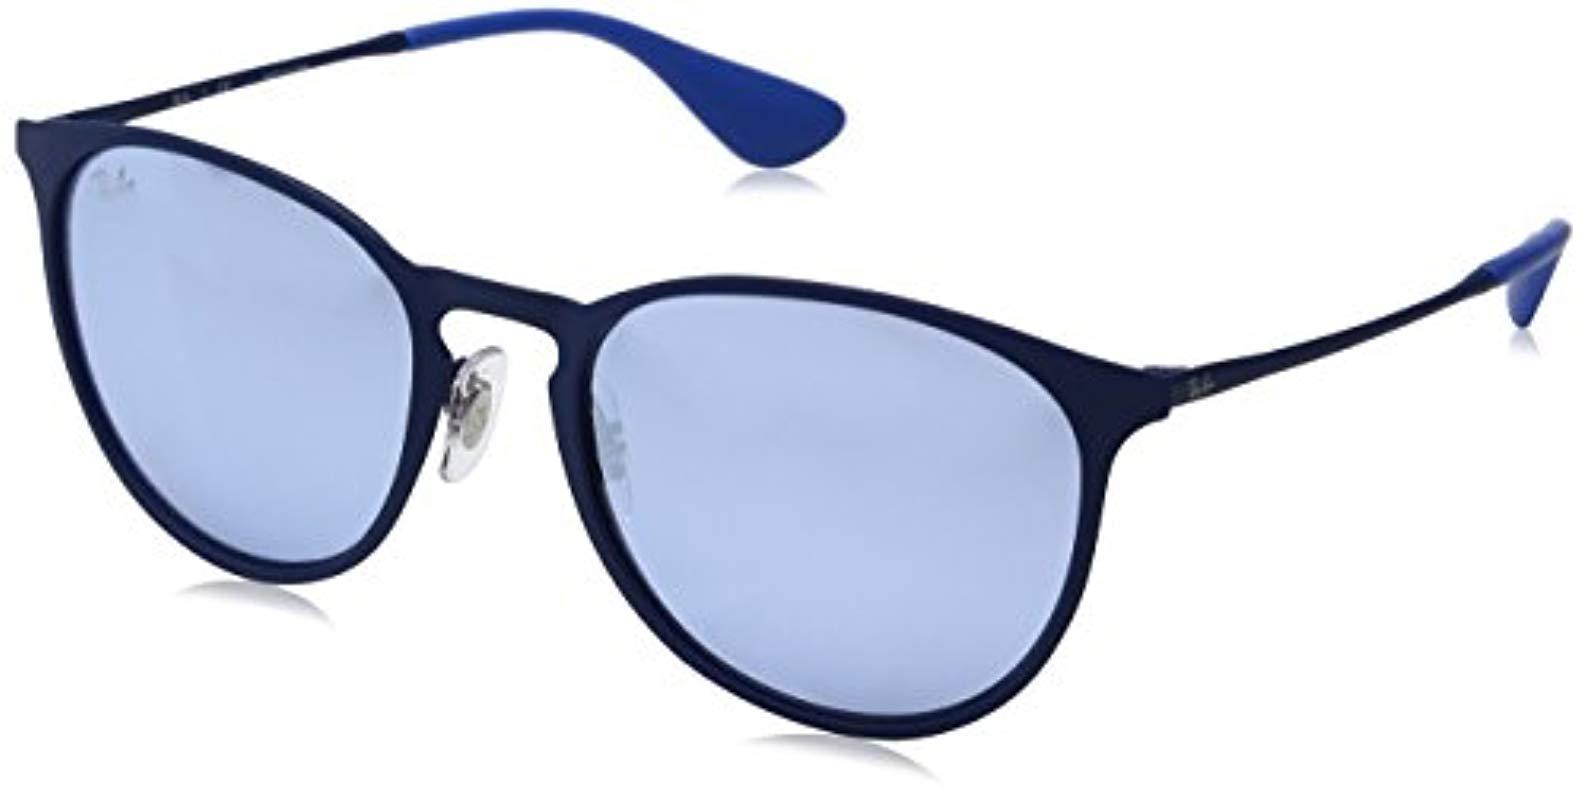 38b2b424cde9a1 Lyst - Ray-Ban Erika Metal Non-polarized Sunglasses (rb3539)